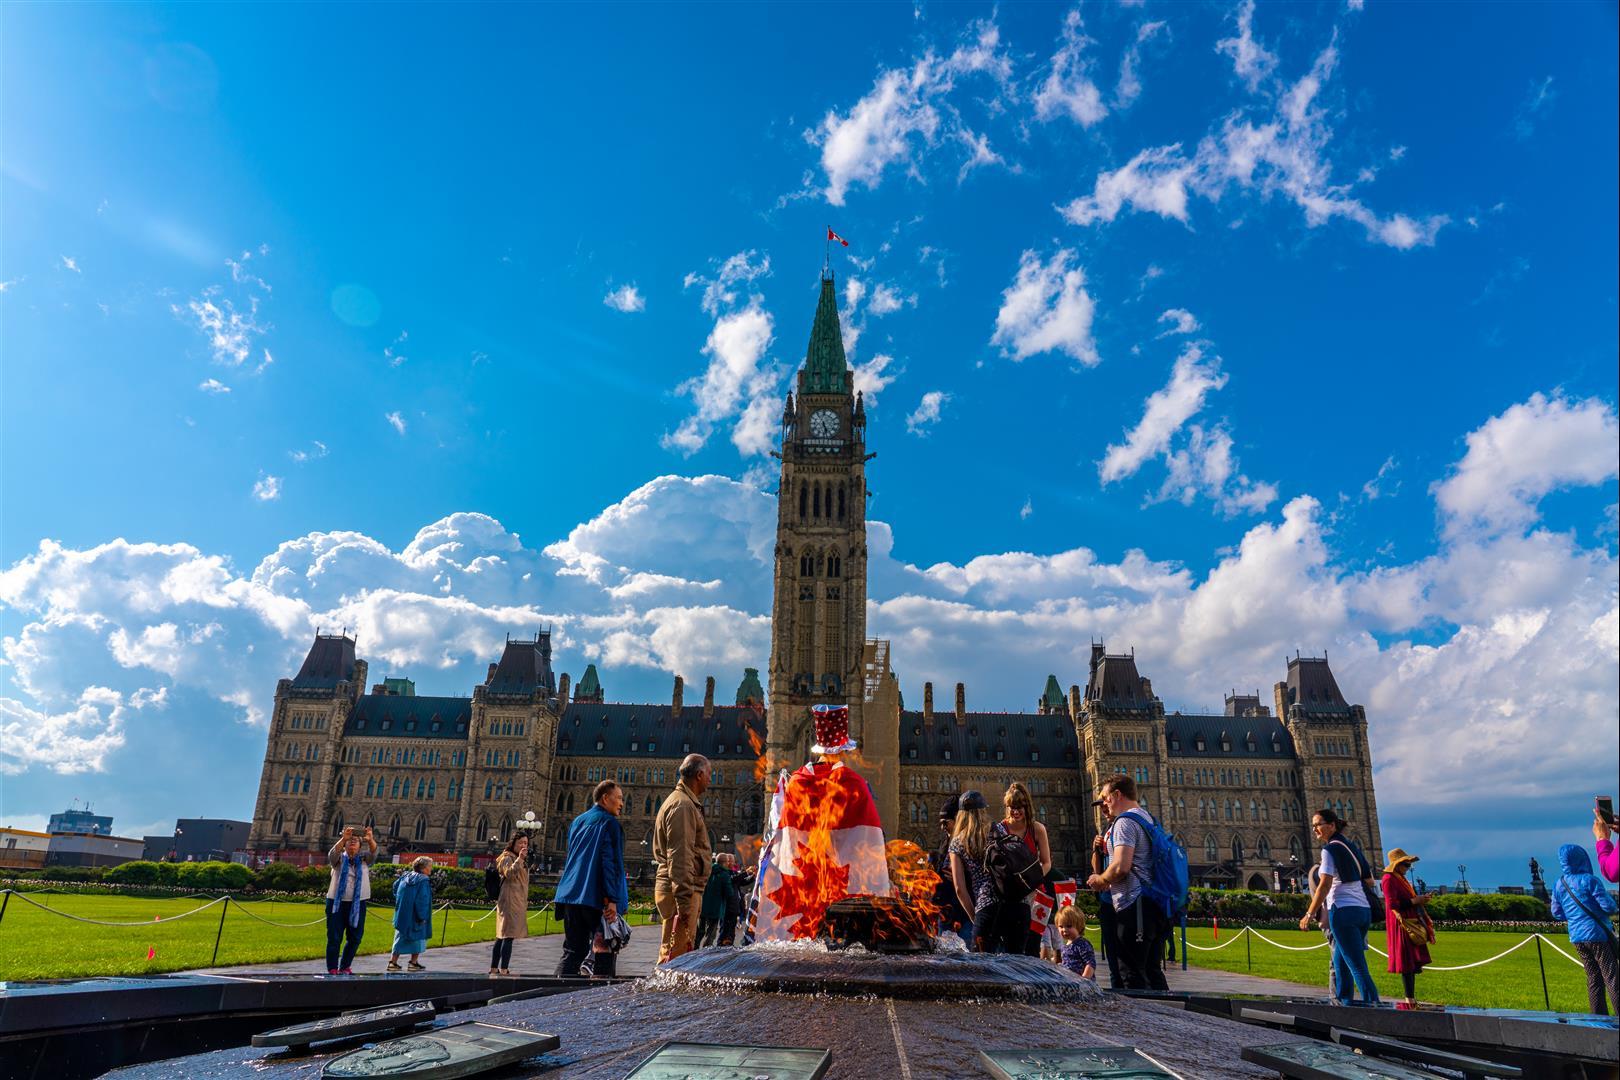 百年火焰 Centennial Flame